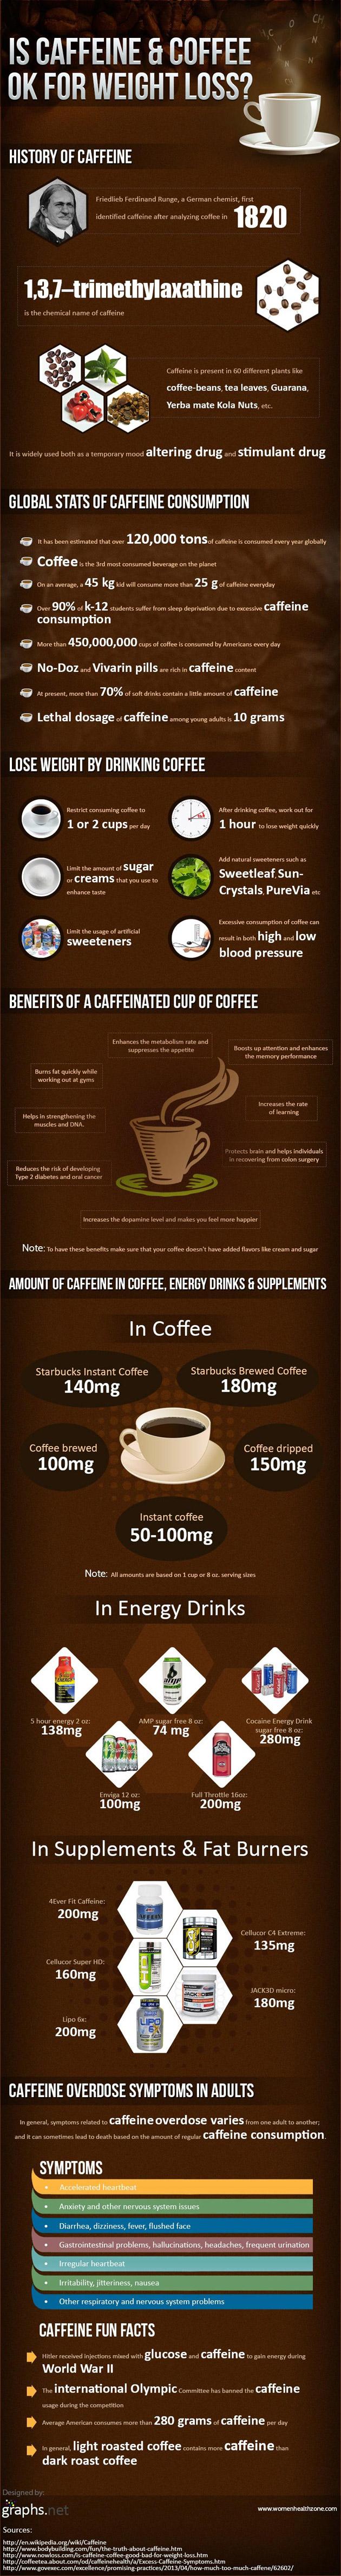 кофе и холестерин